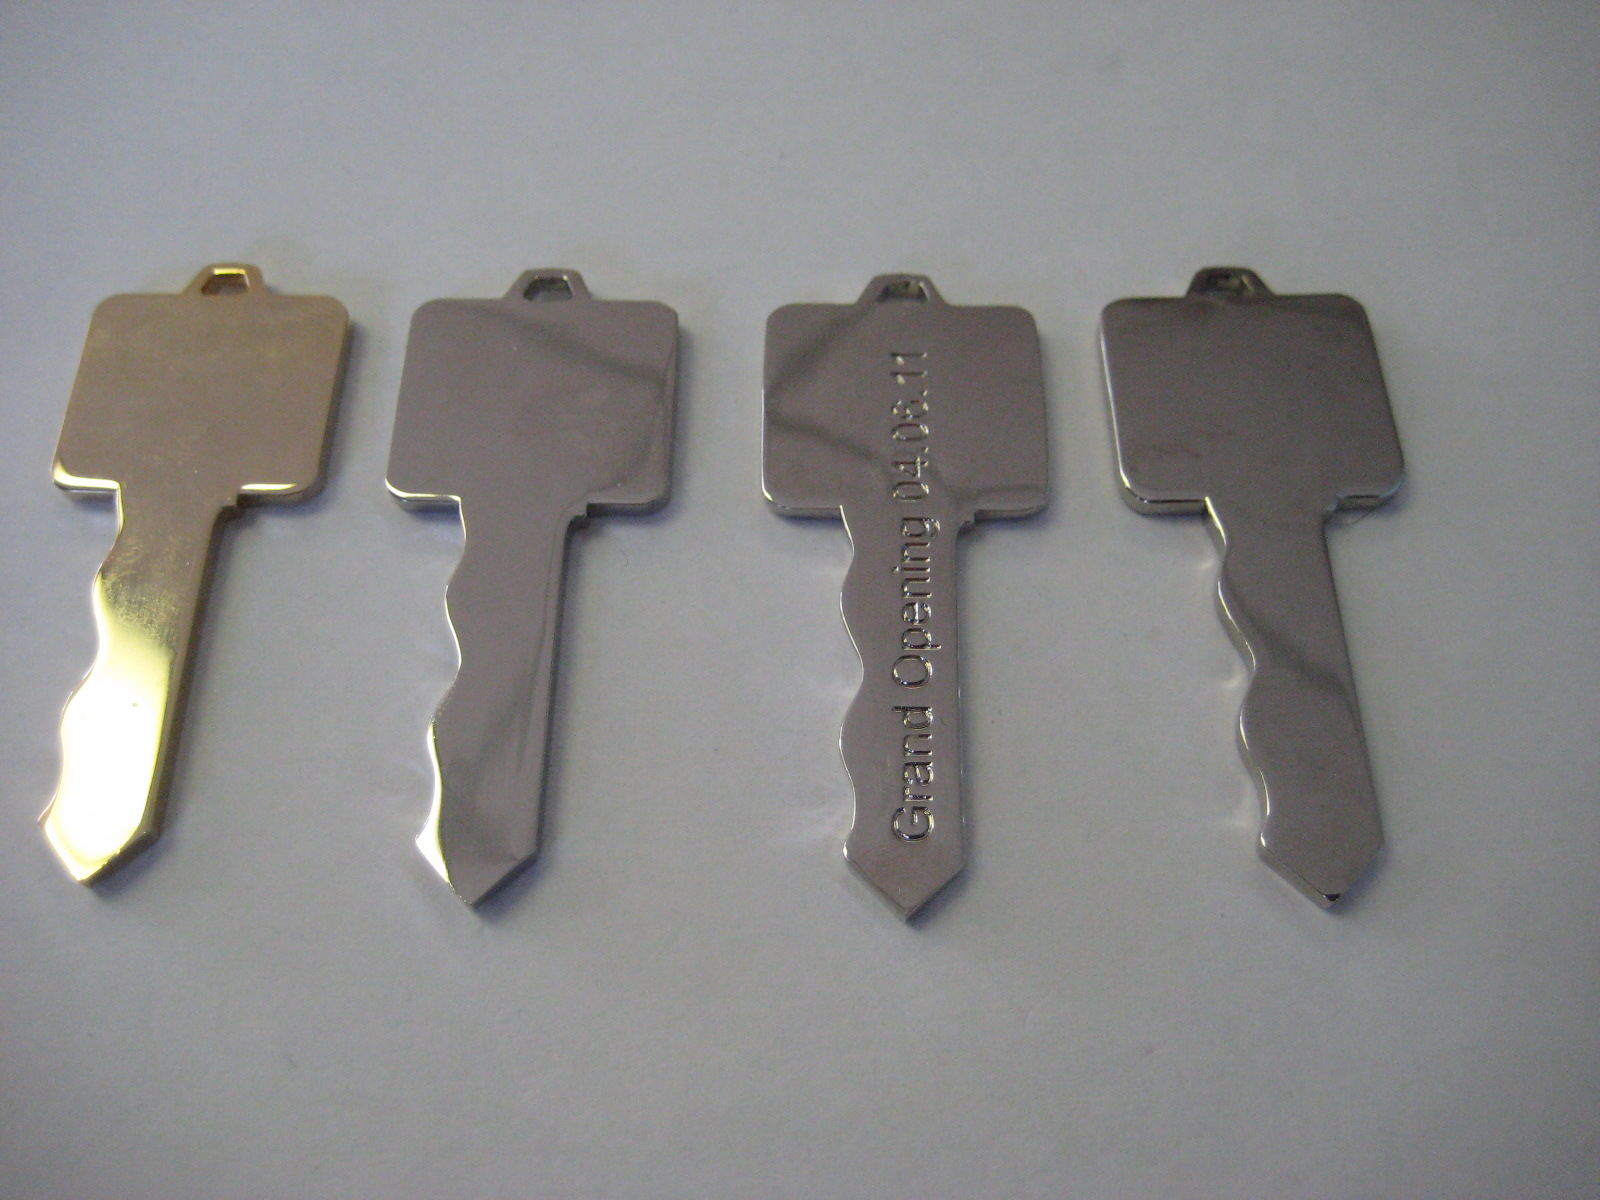 New London Playboy Club Keys